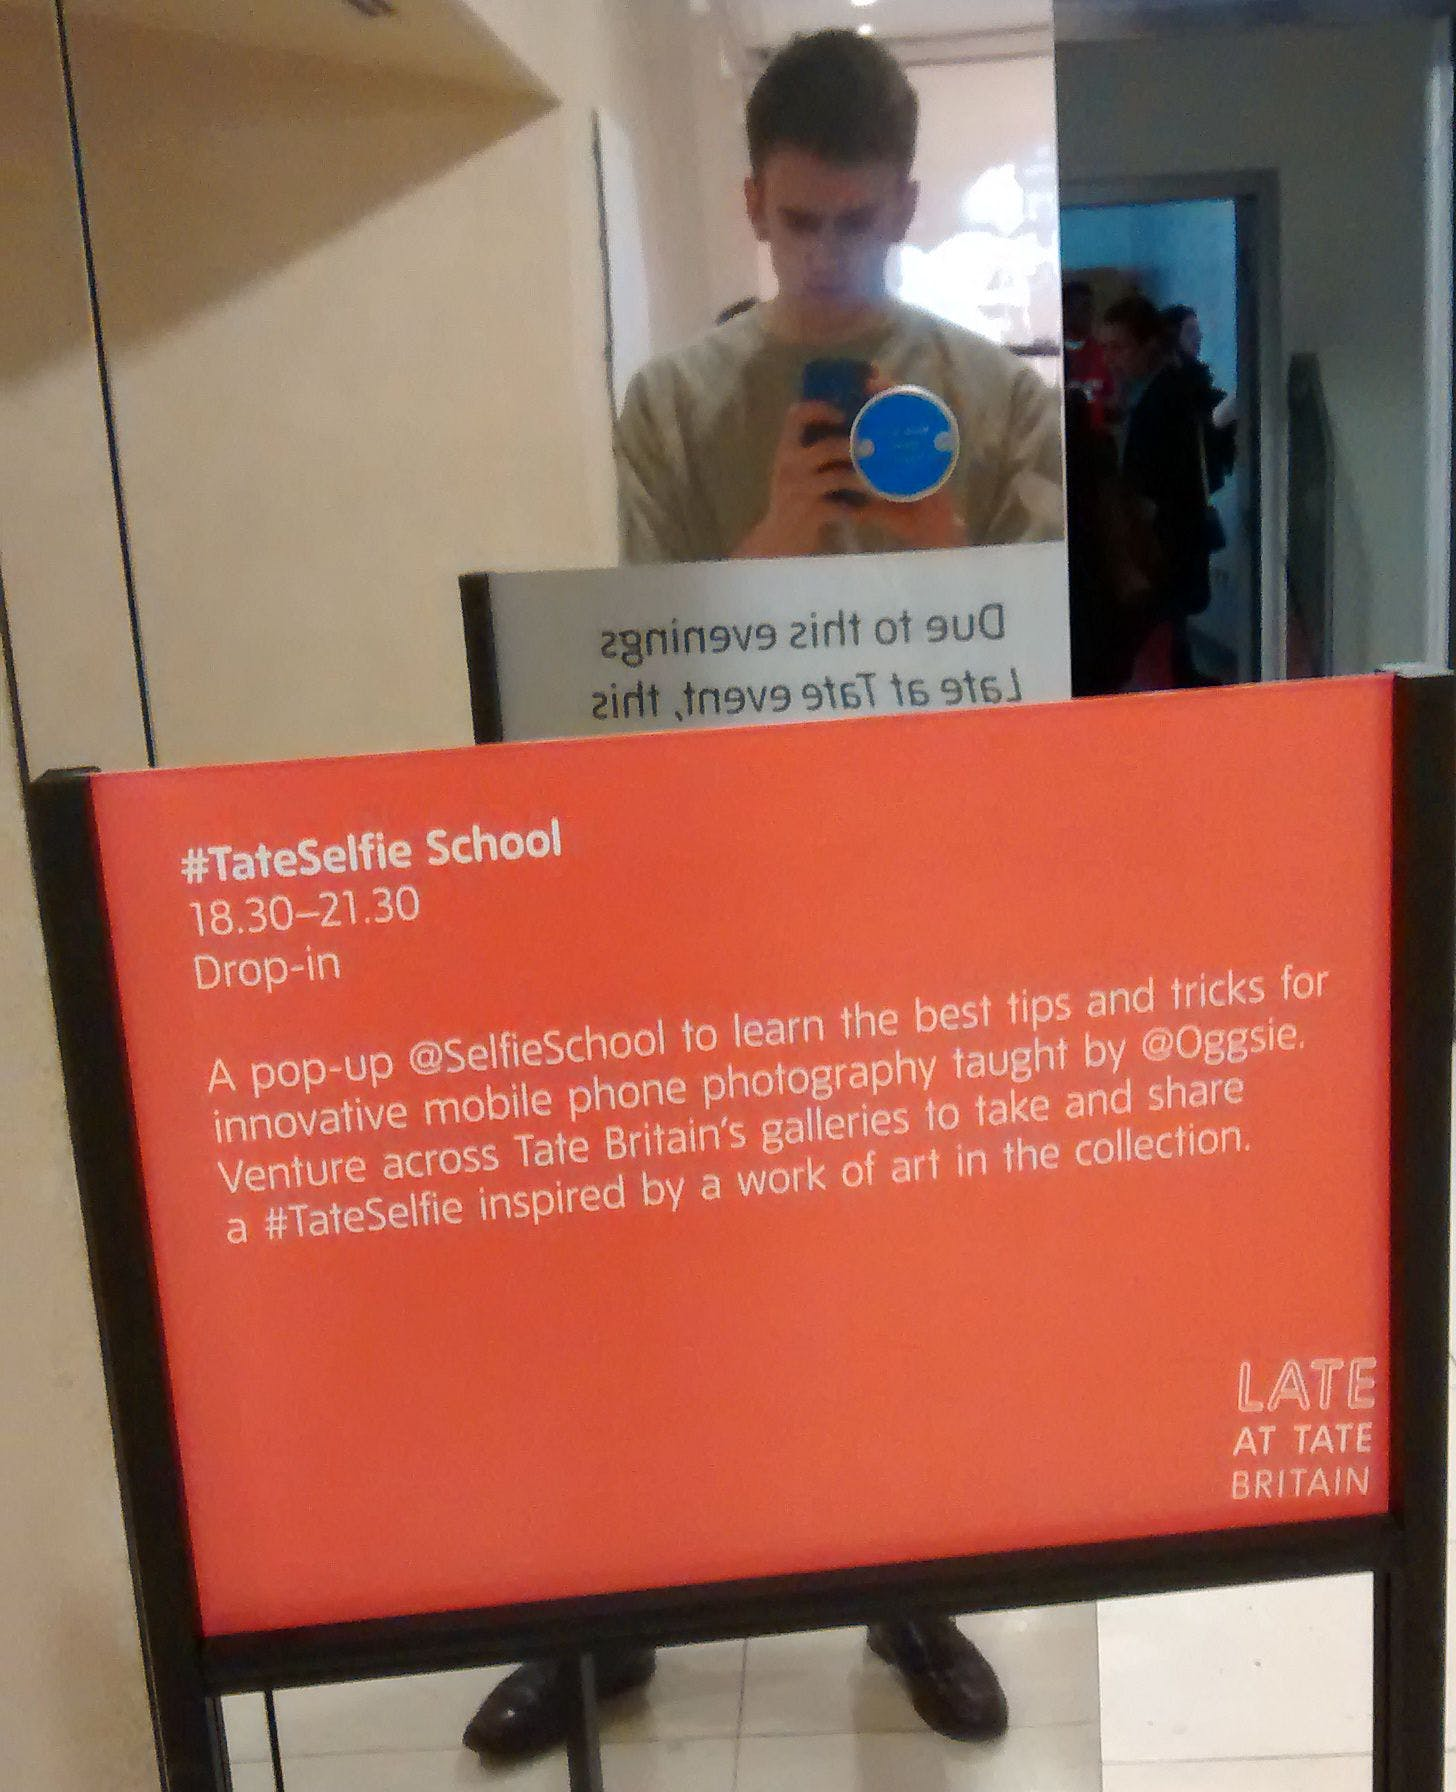 My first selfie for #TateSelfie School